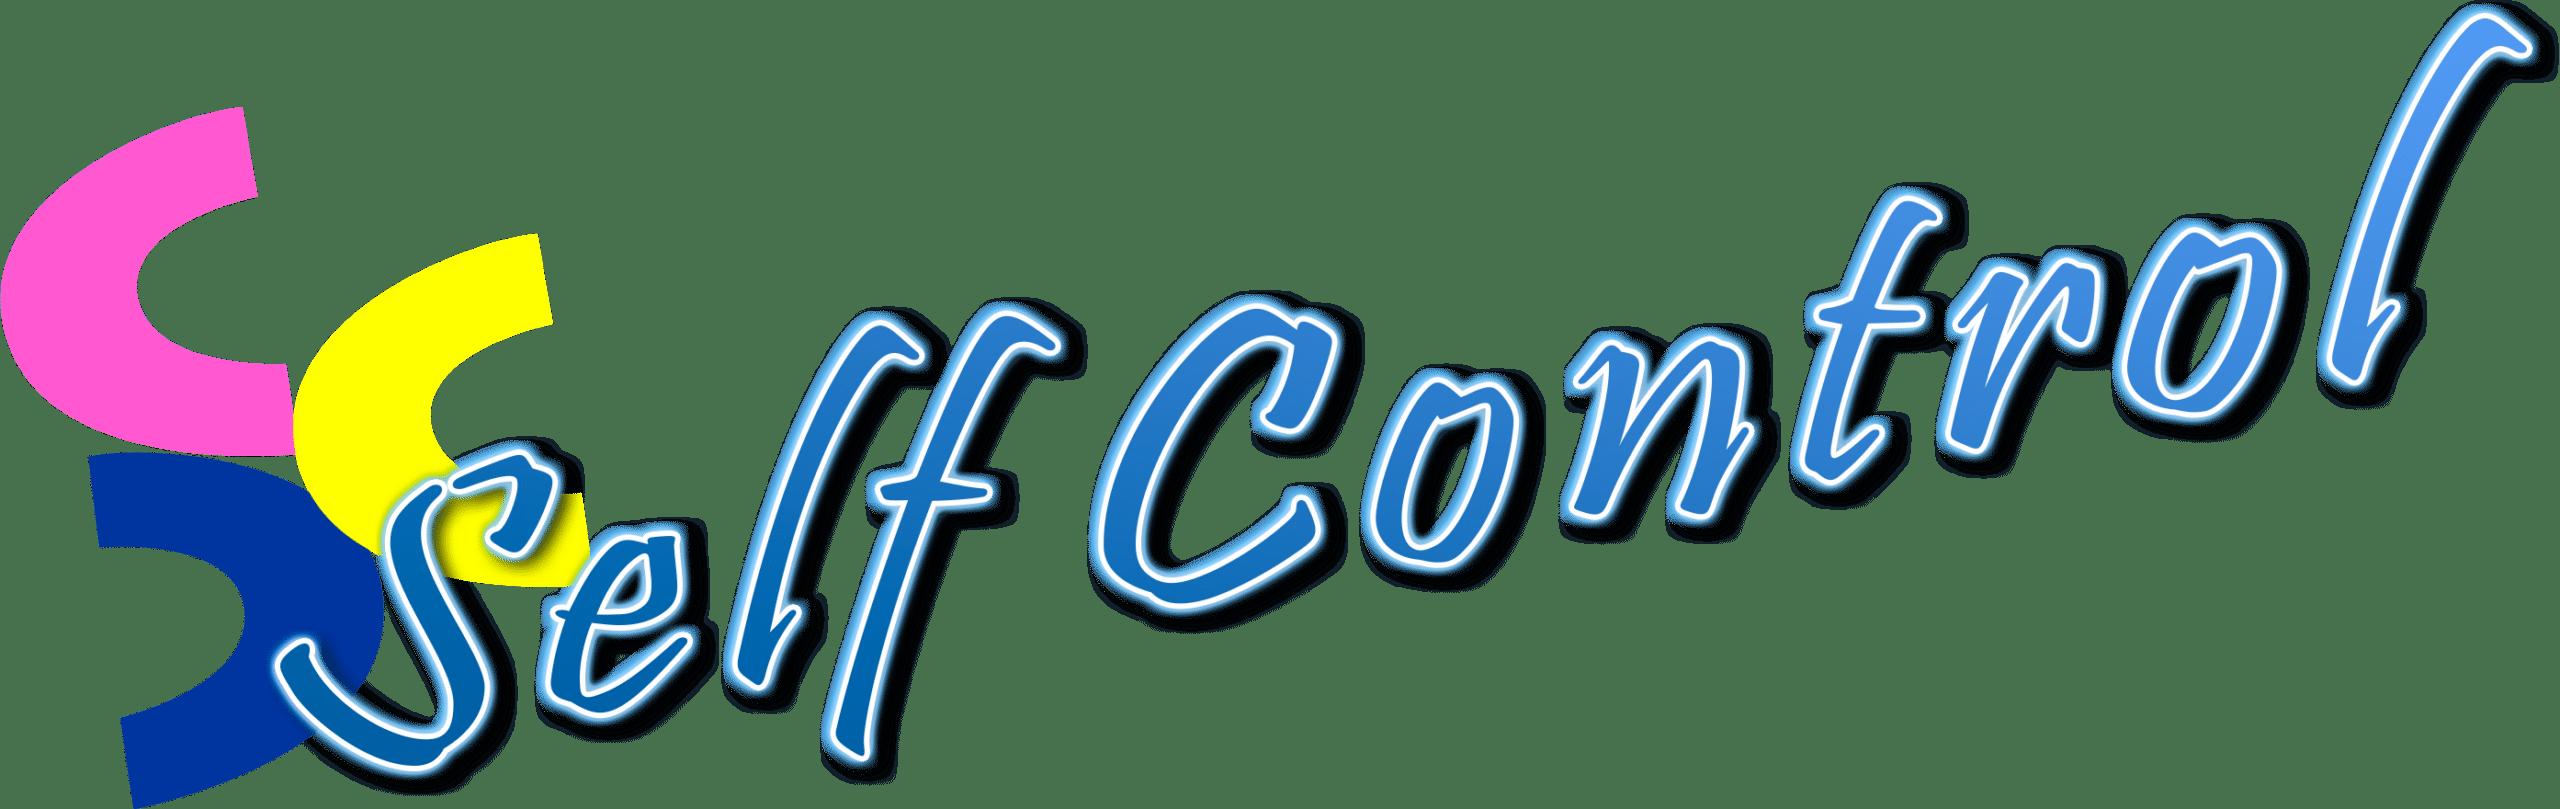 dentalbest_logo_selfcontrol